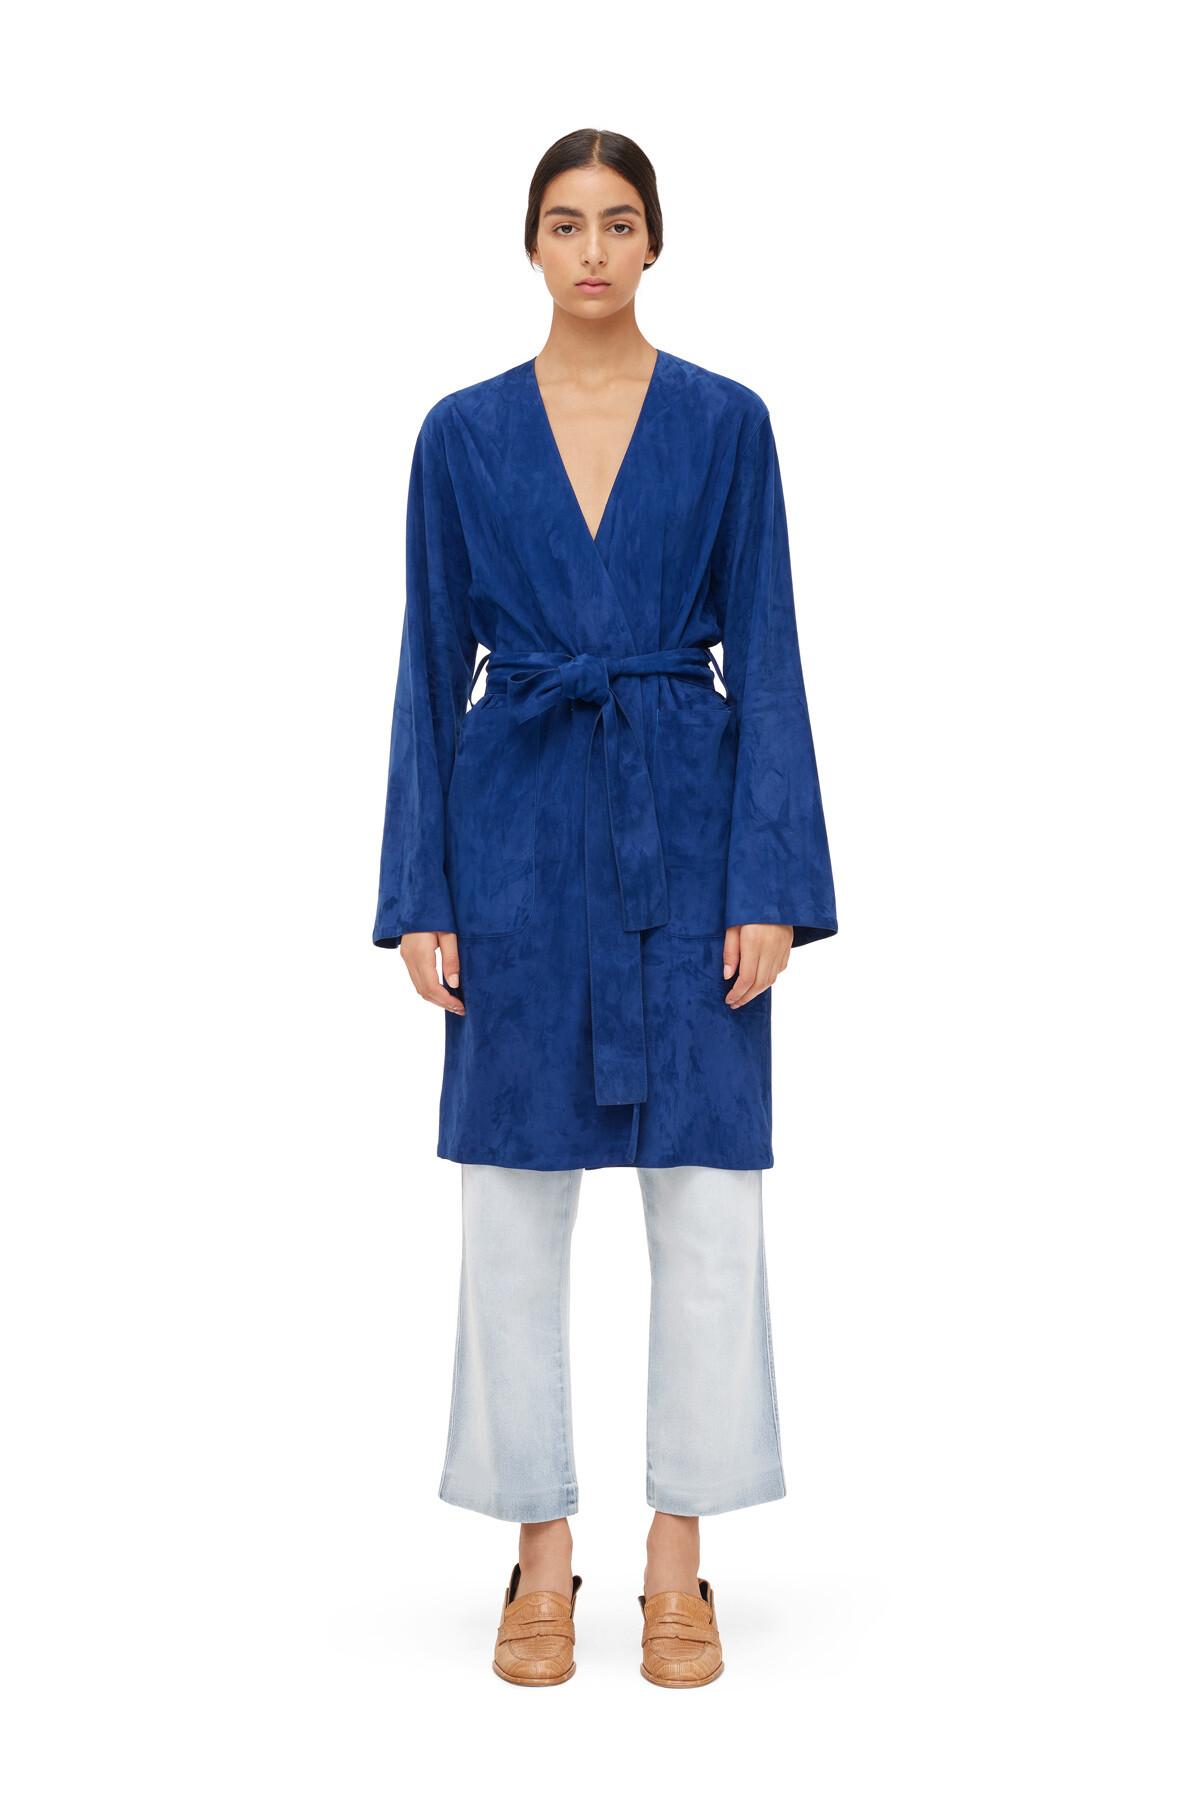 LOEWE Abrigo Azul Royal Oscuro front